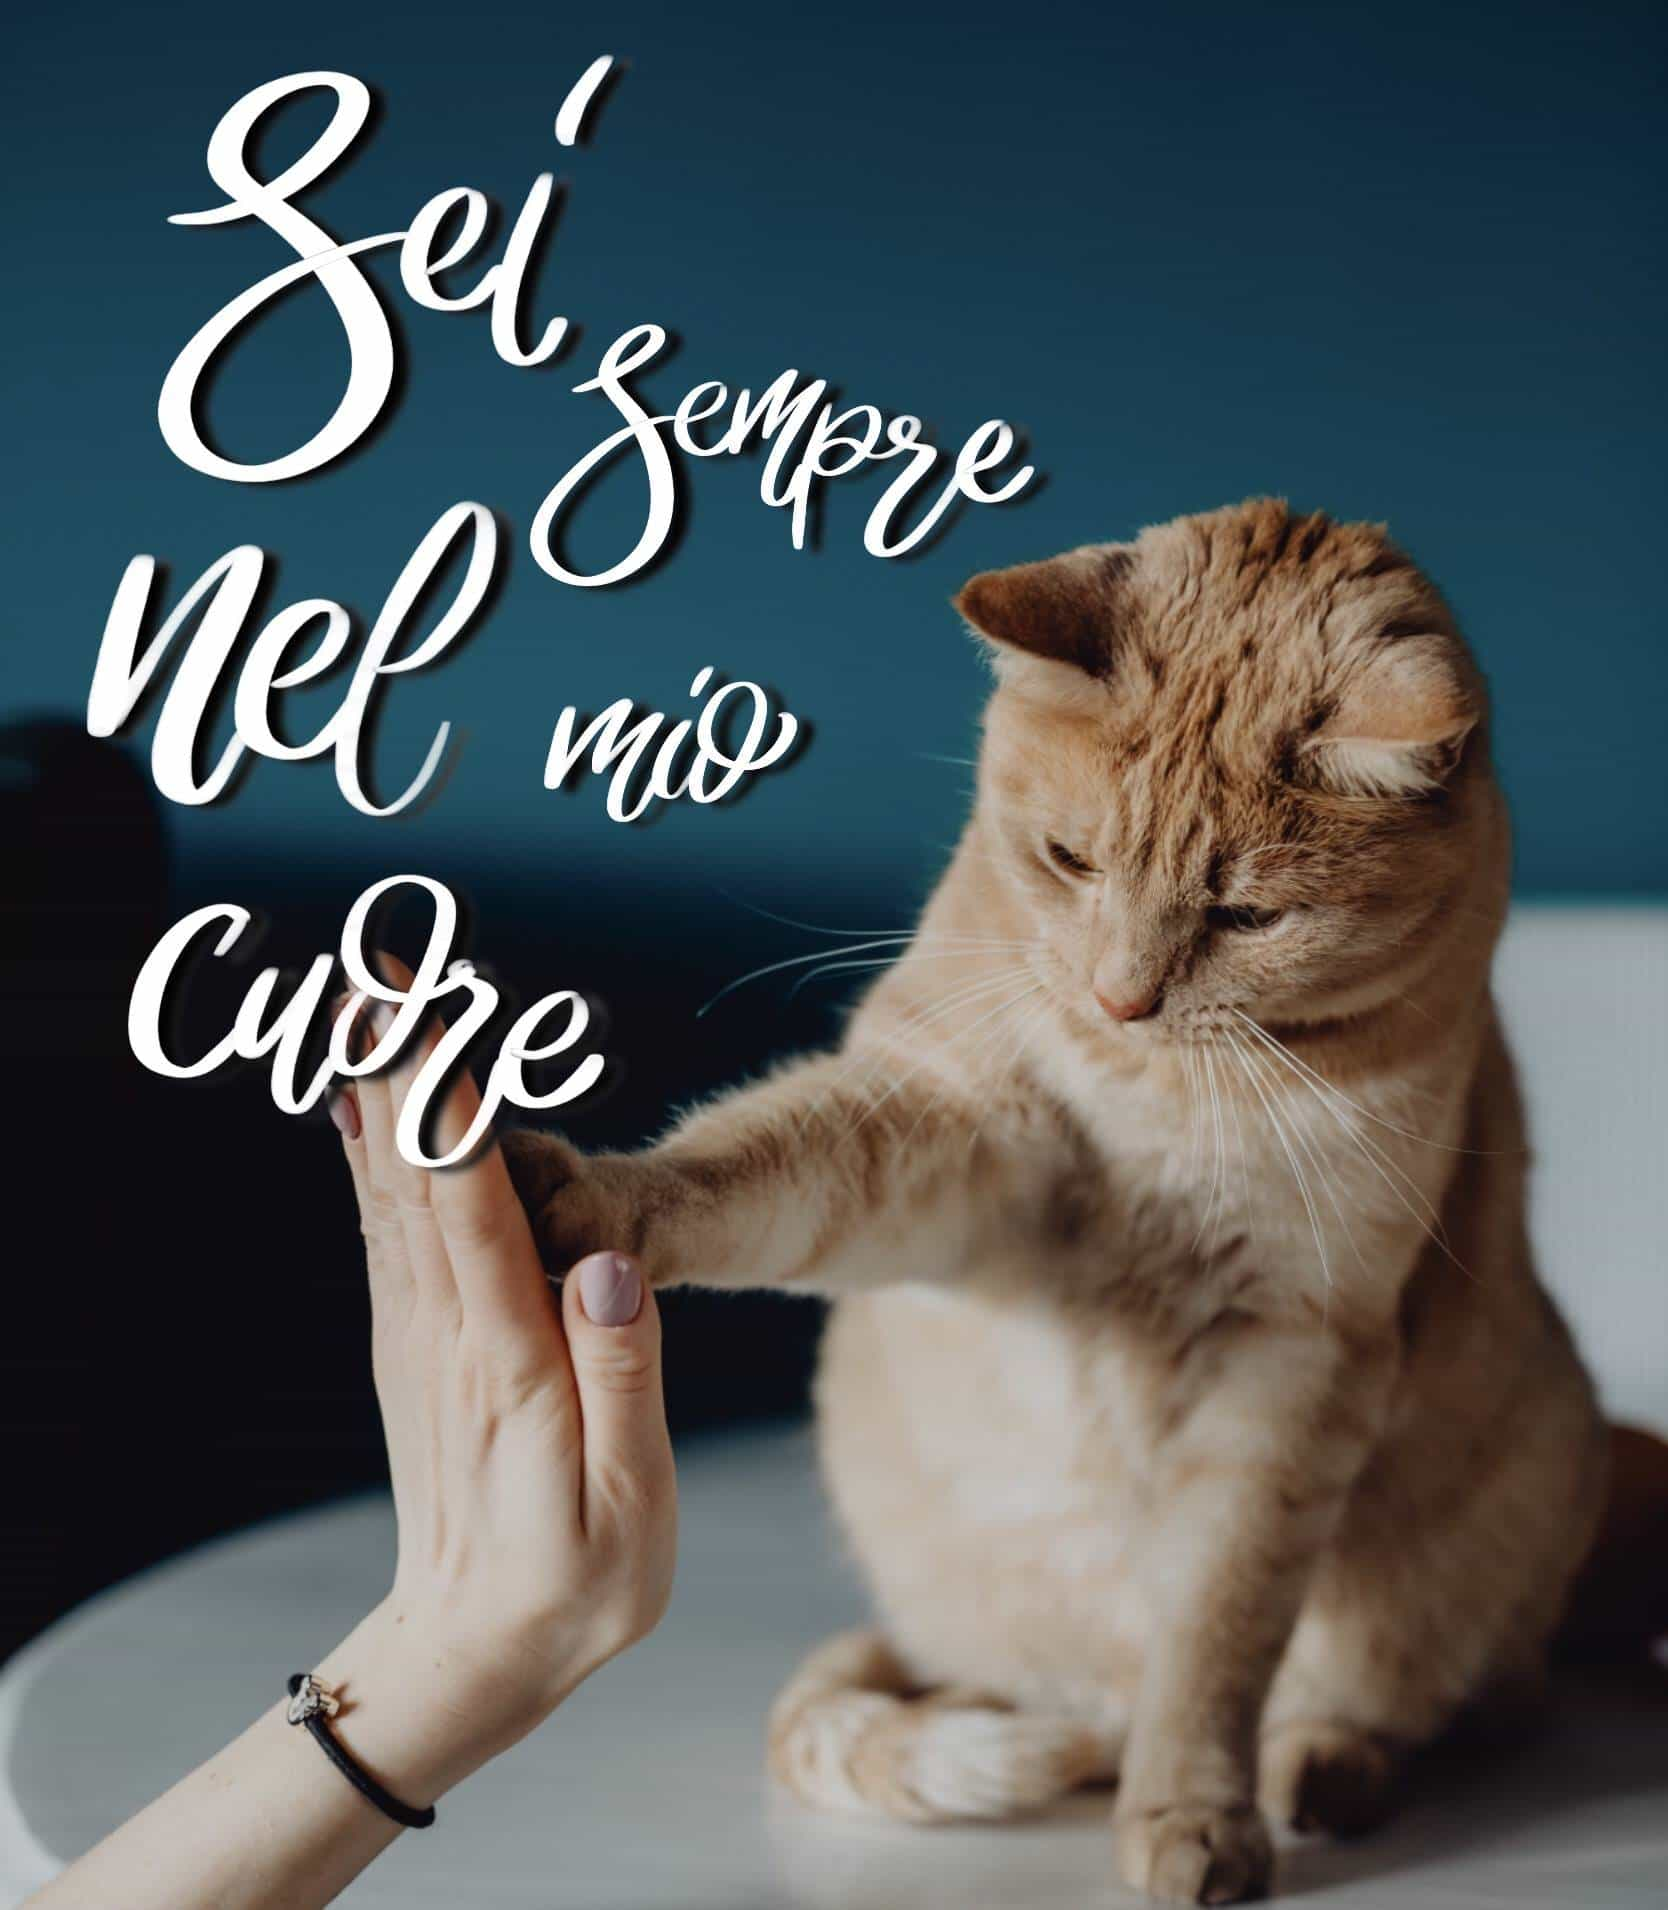 buonanotte gattini, buonanotte gatto, buonanotte animale